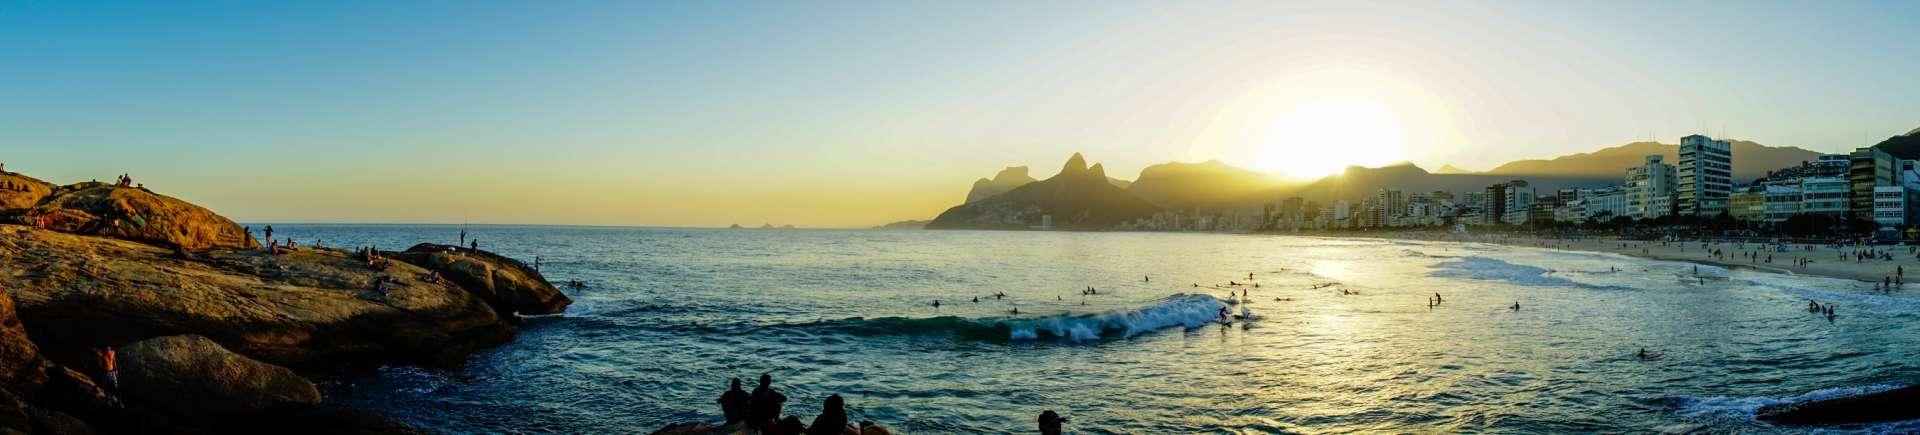 Rio de Janeiro Pescart Enrico Pescantini Ipanema sunset